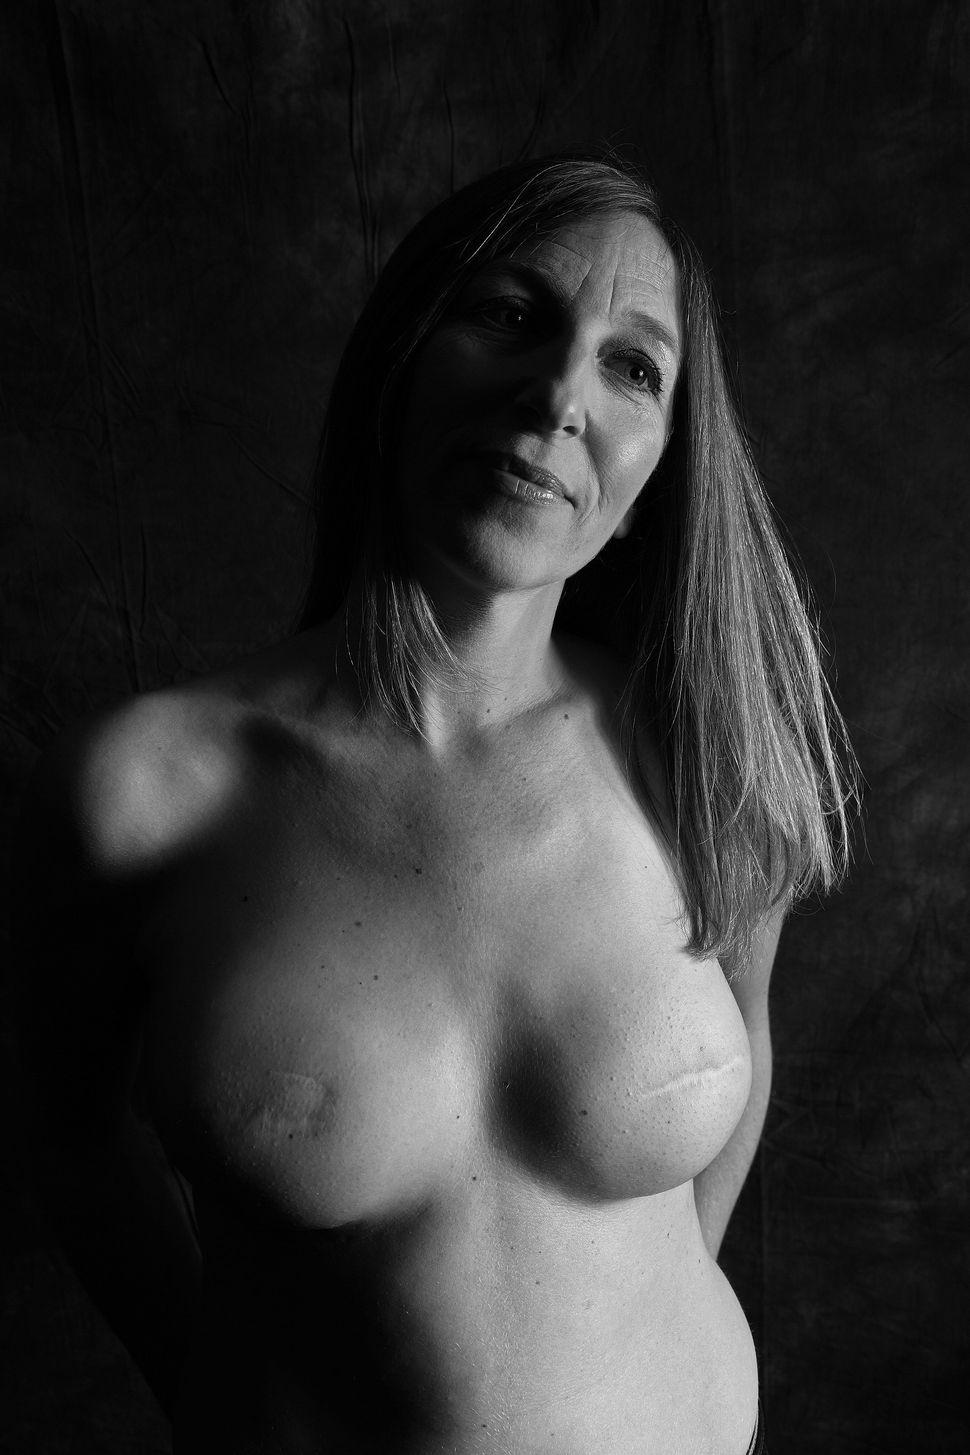 Sharon from Bath